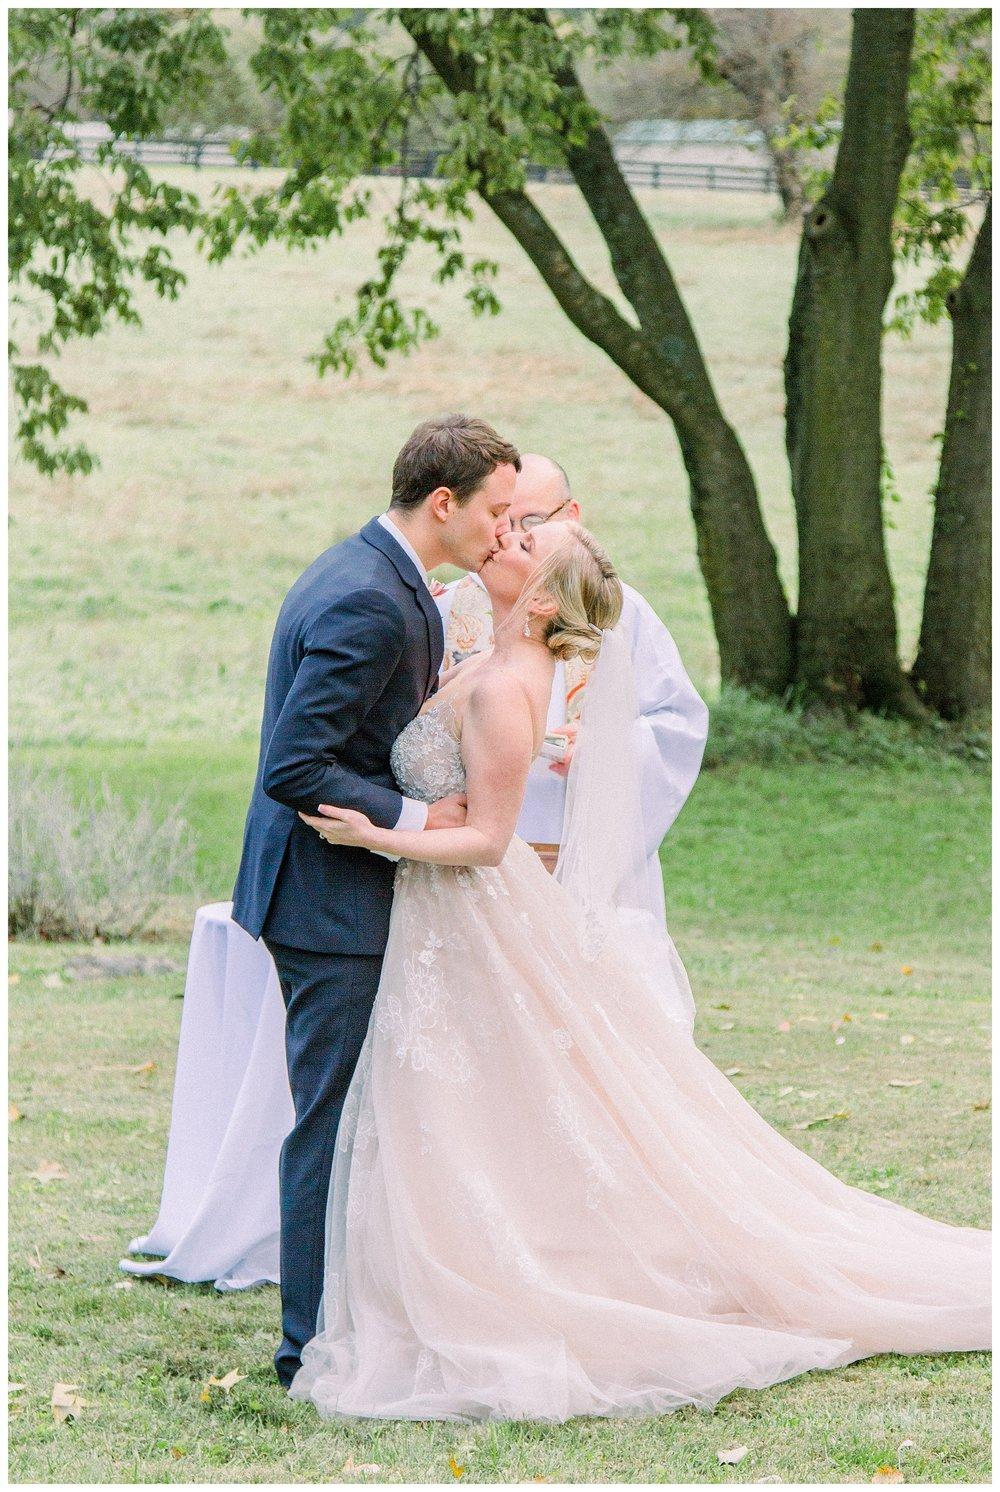 Whitehall Estate Wedding | Northern Virginia Wedding Photographer Kir Tuben_0072.jpg